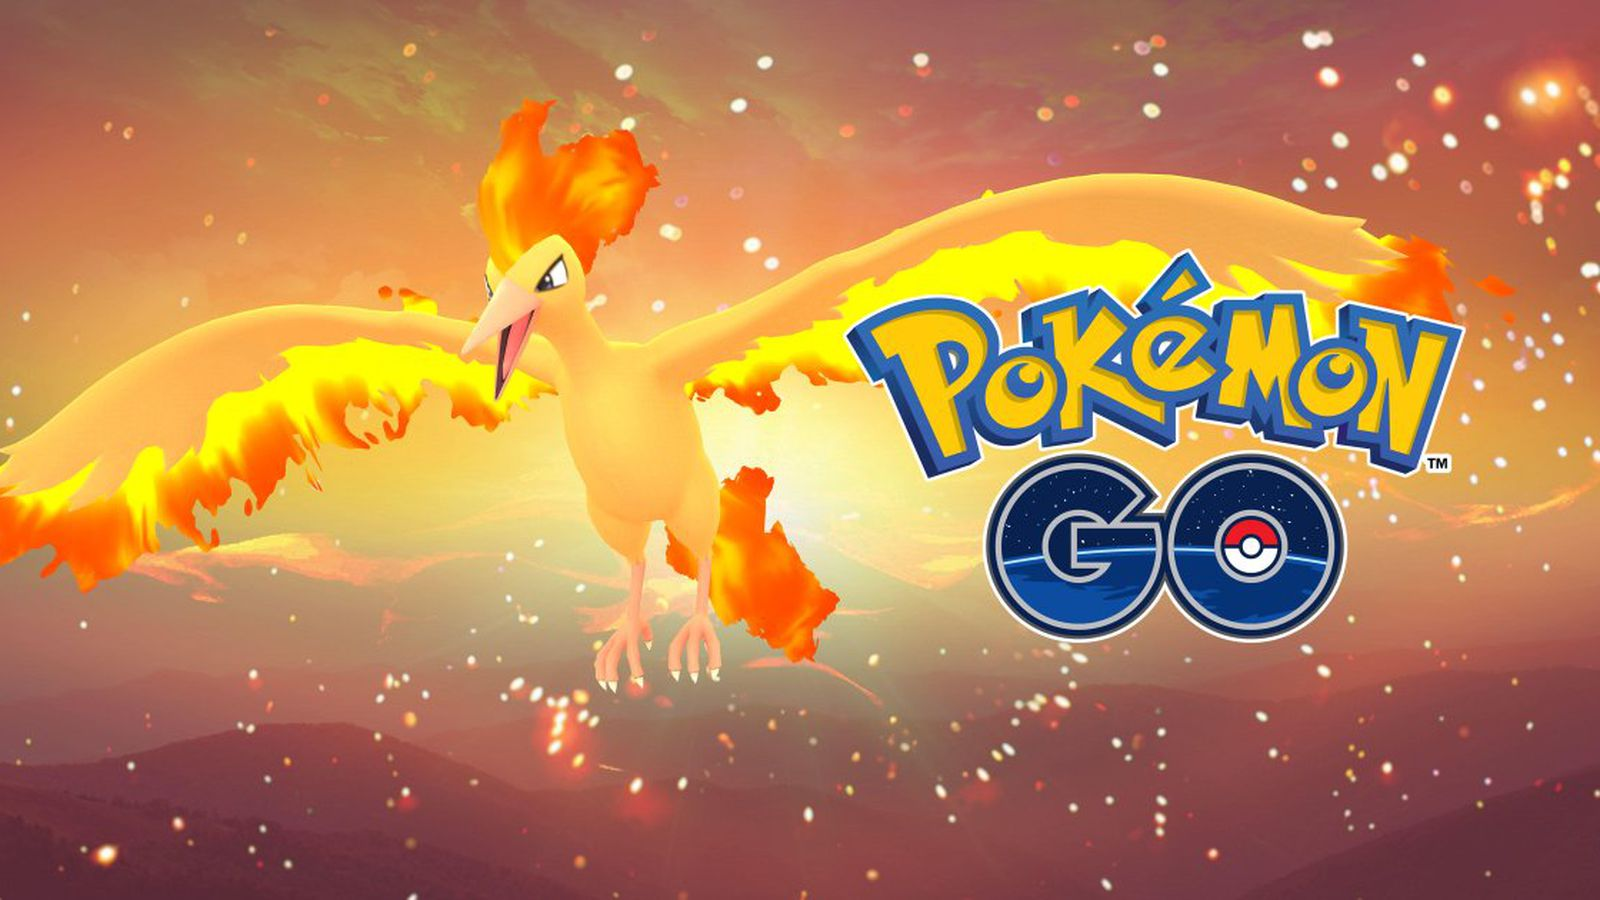 Pokémon Go raids are a mess of bugs, and players deserve compensation